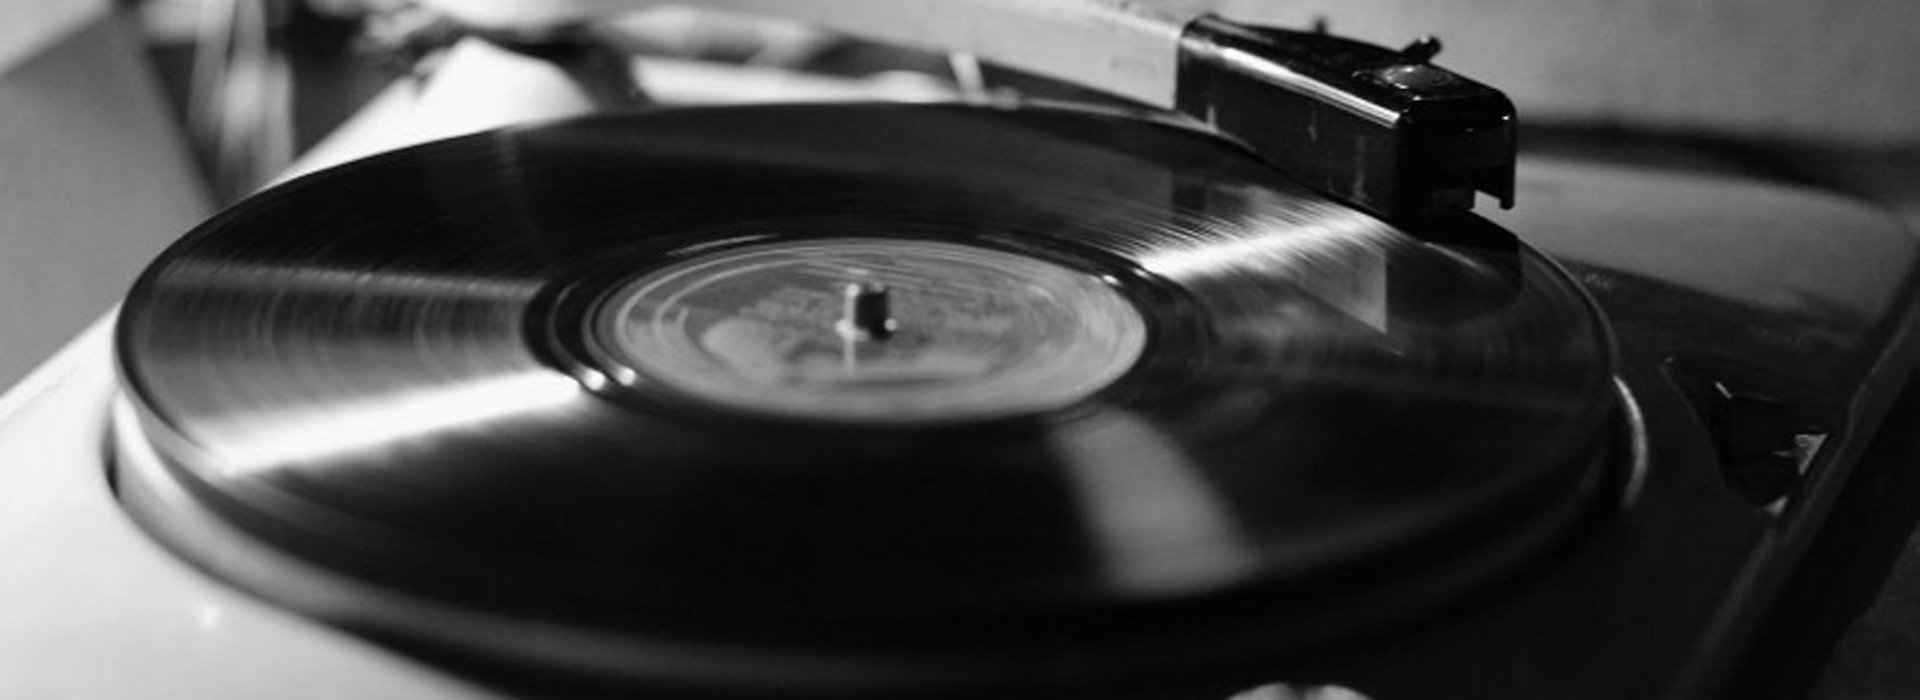 Schallplatten digialisieren